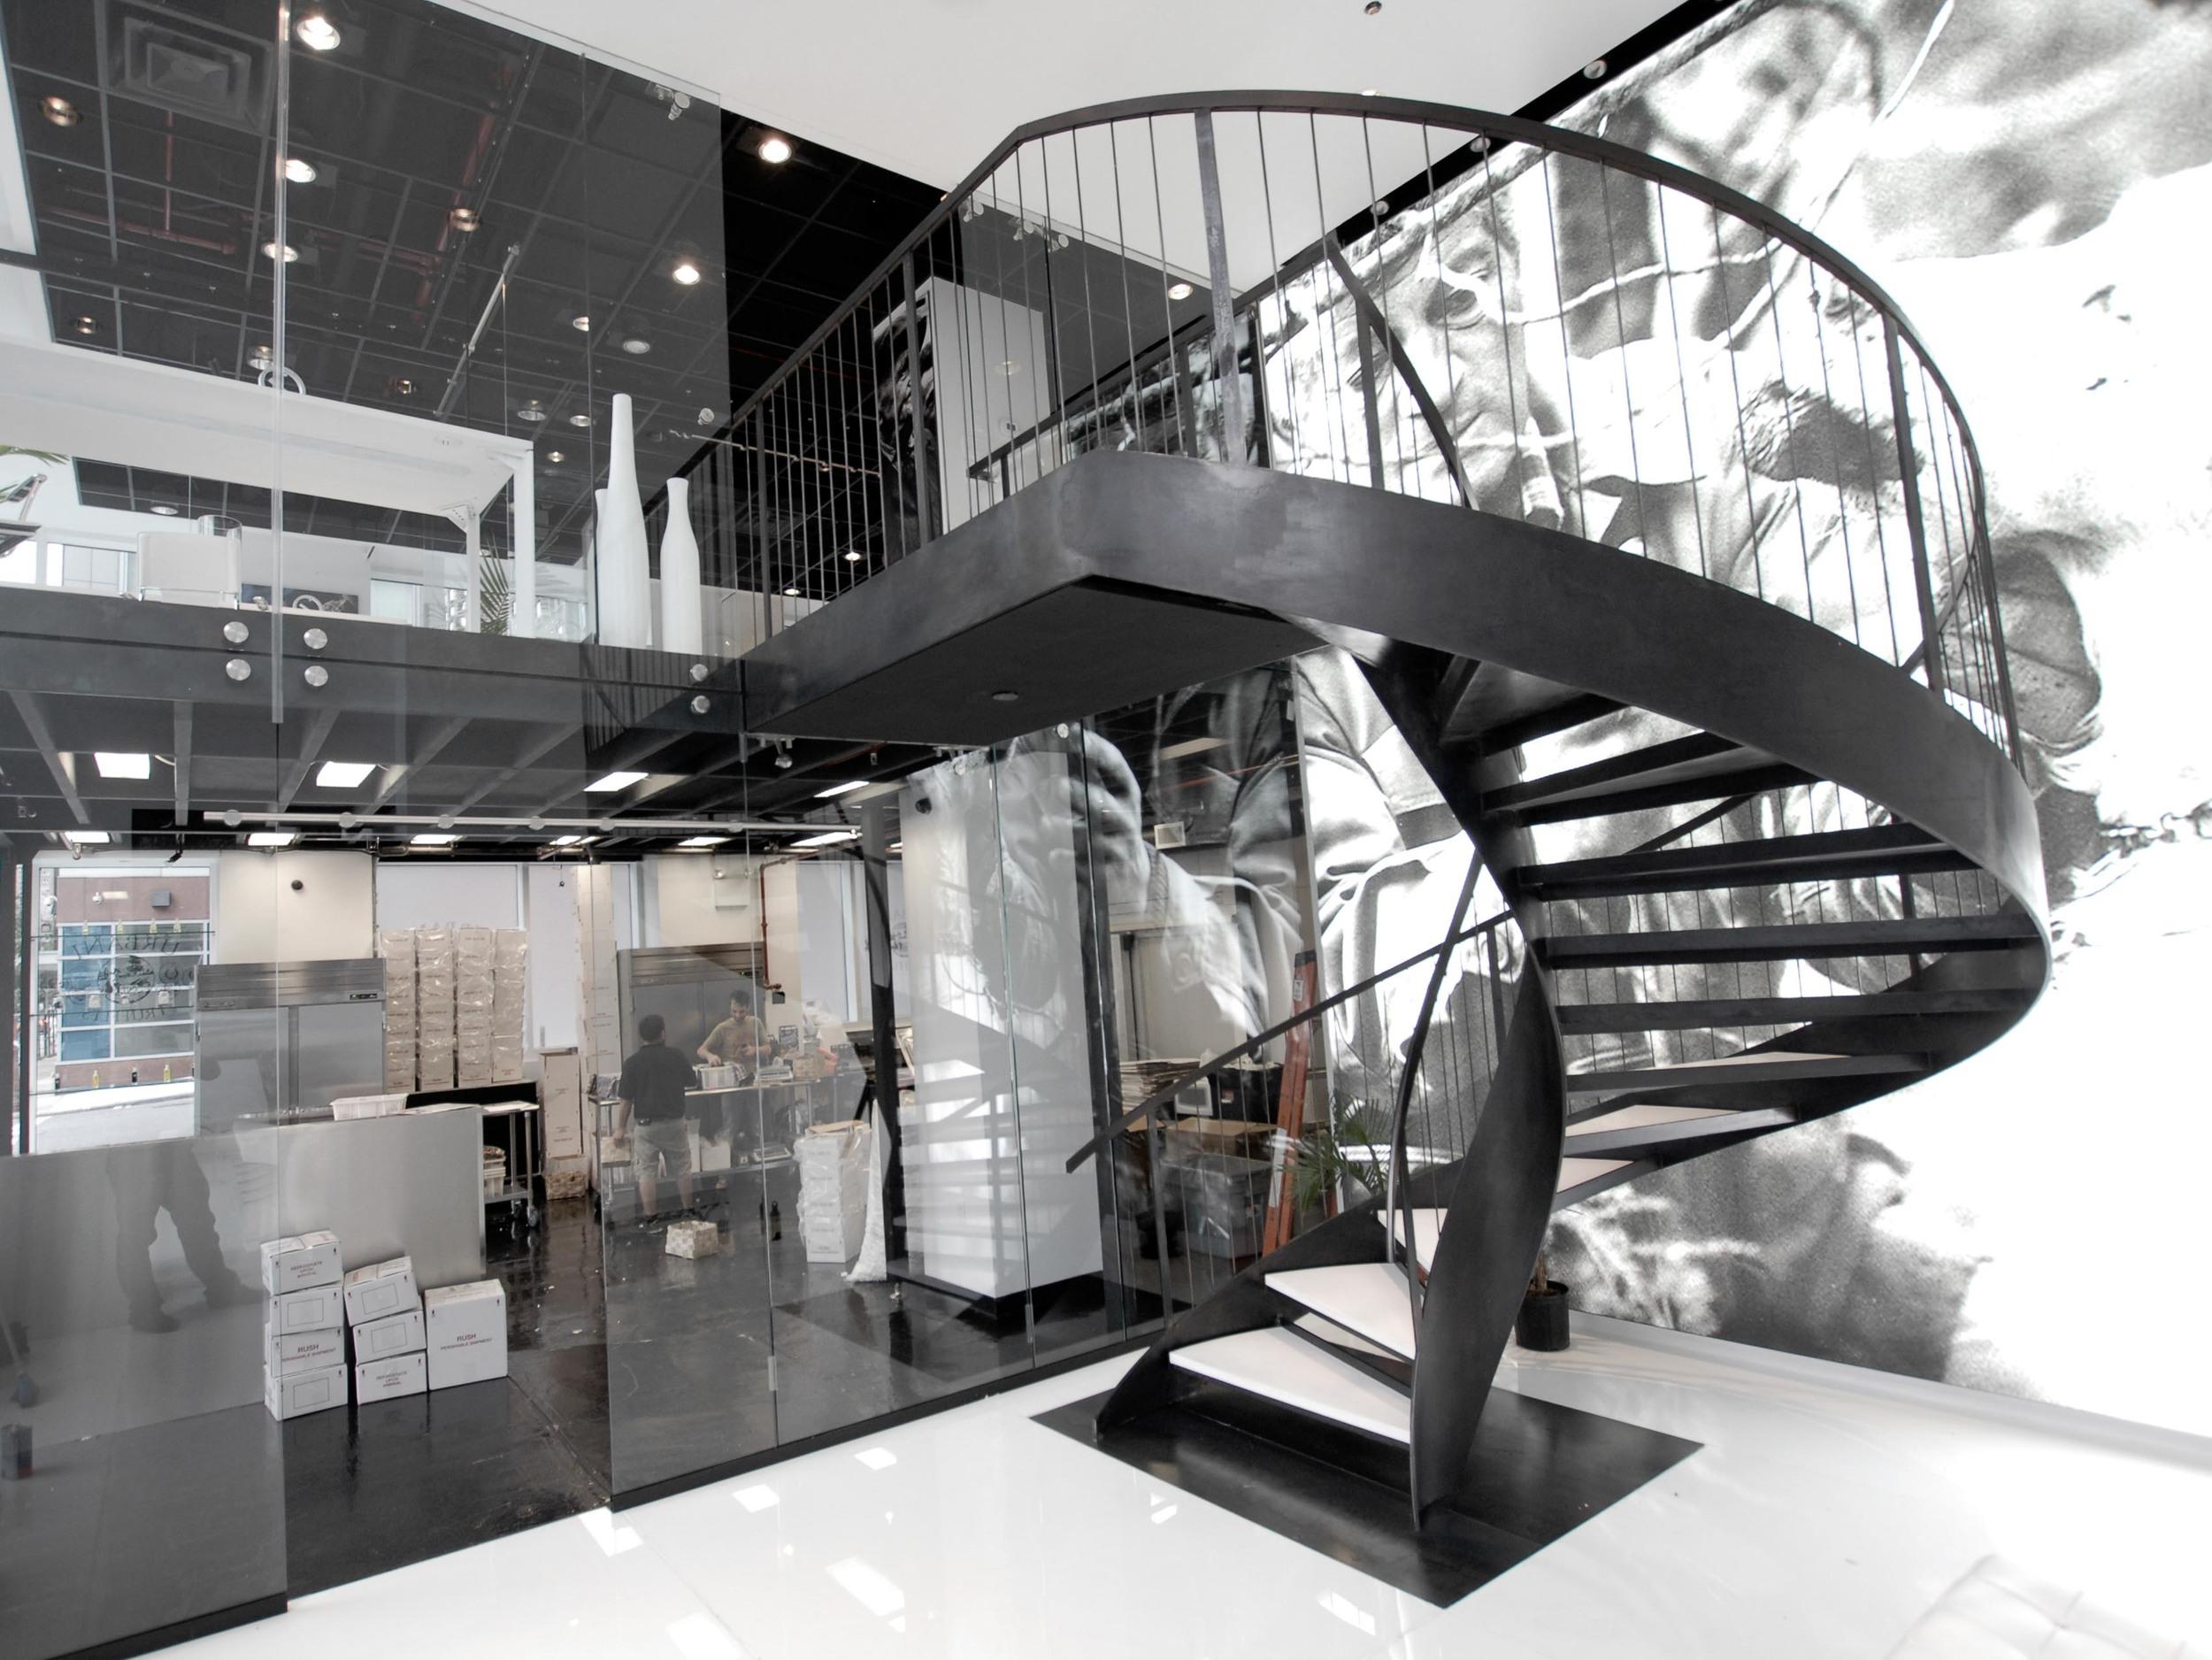 Blackened Steel Helix Staircase